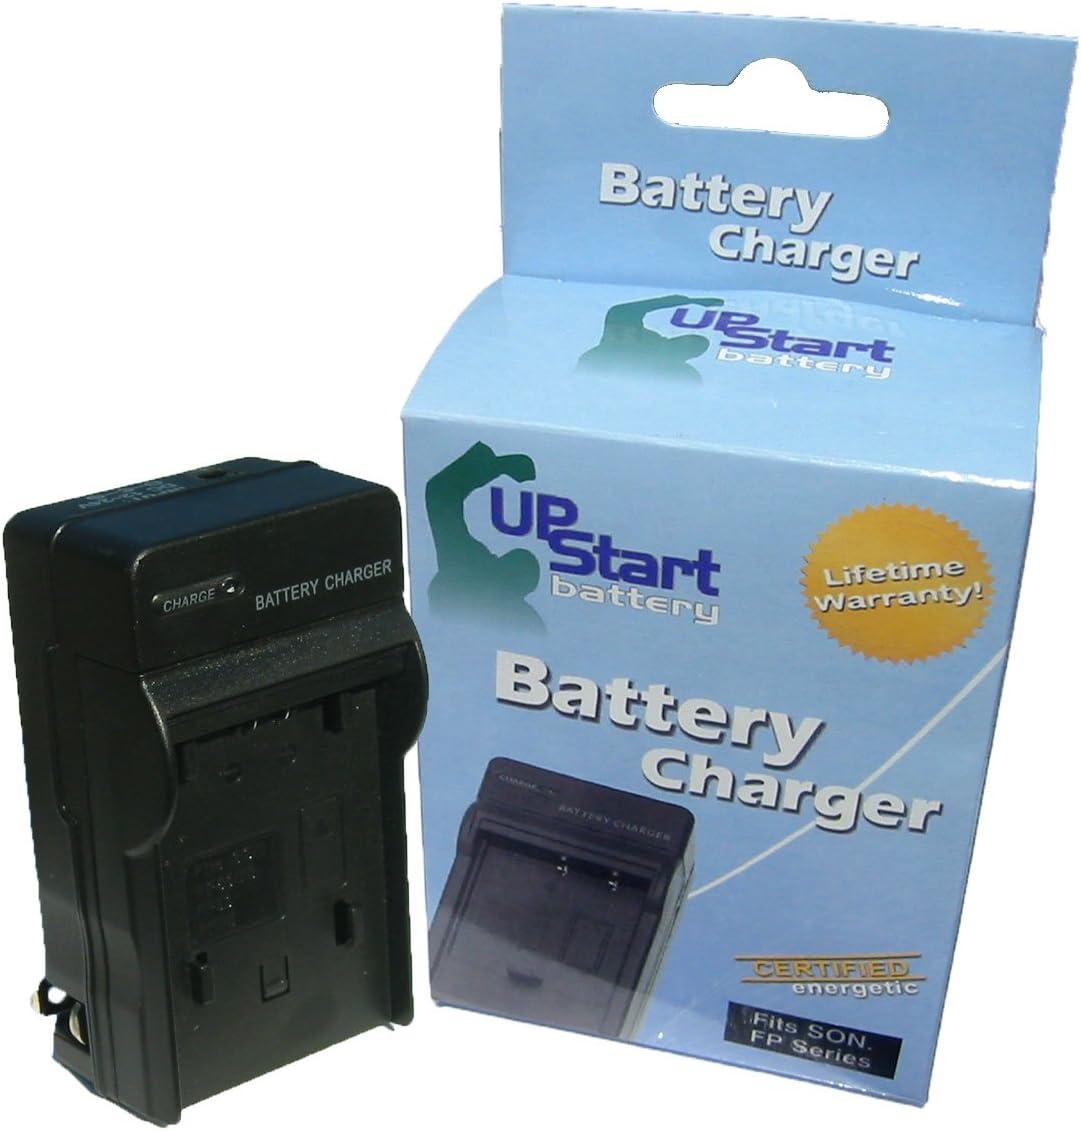 Upstart Battery EN-EL21 Replacement Battery Charger for Nikon 1 V2 Digital Camera Brand with